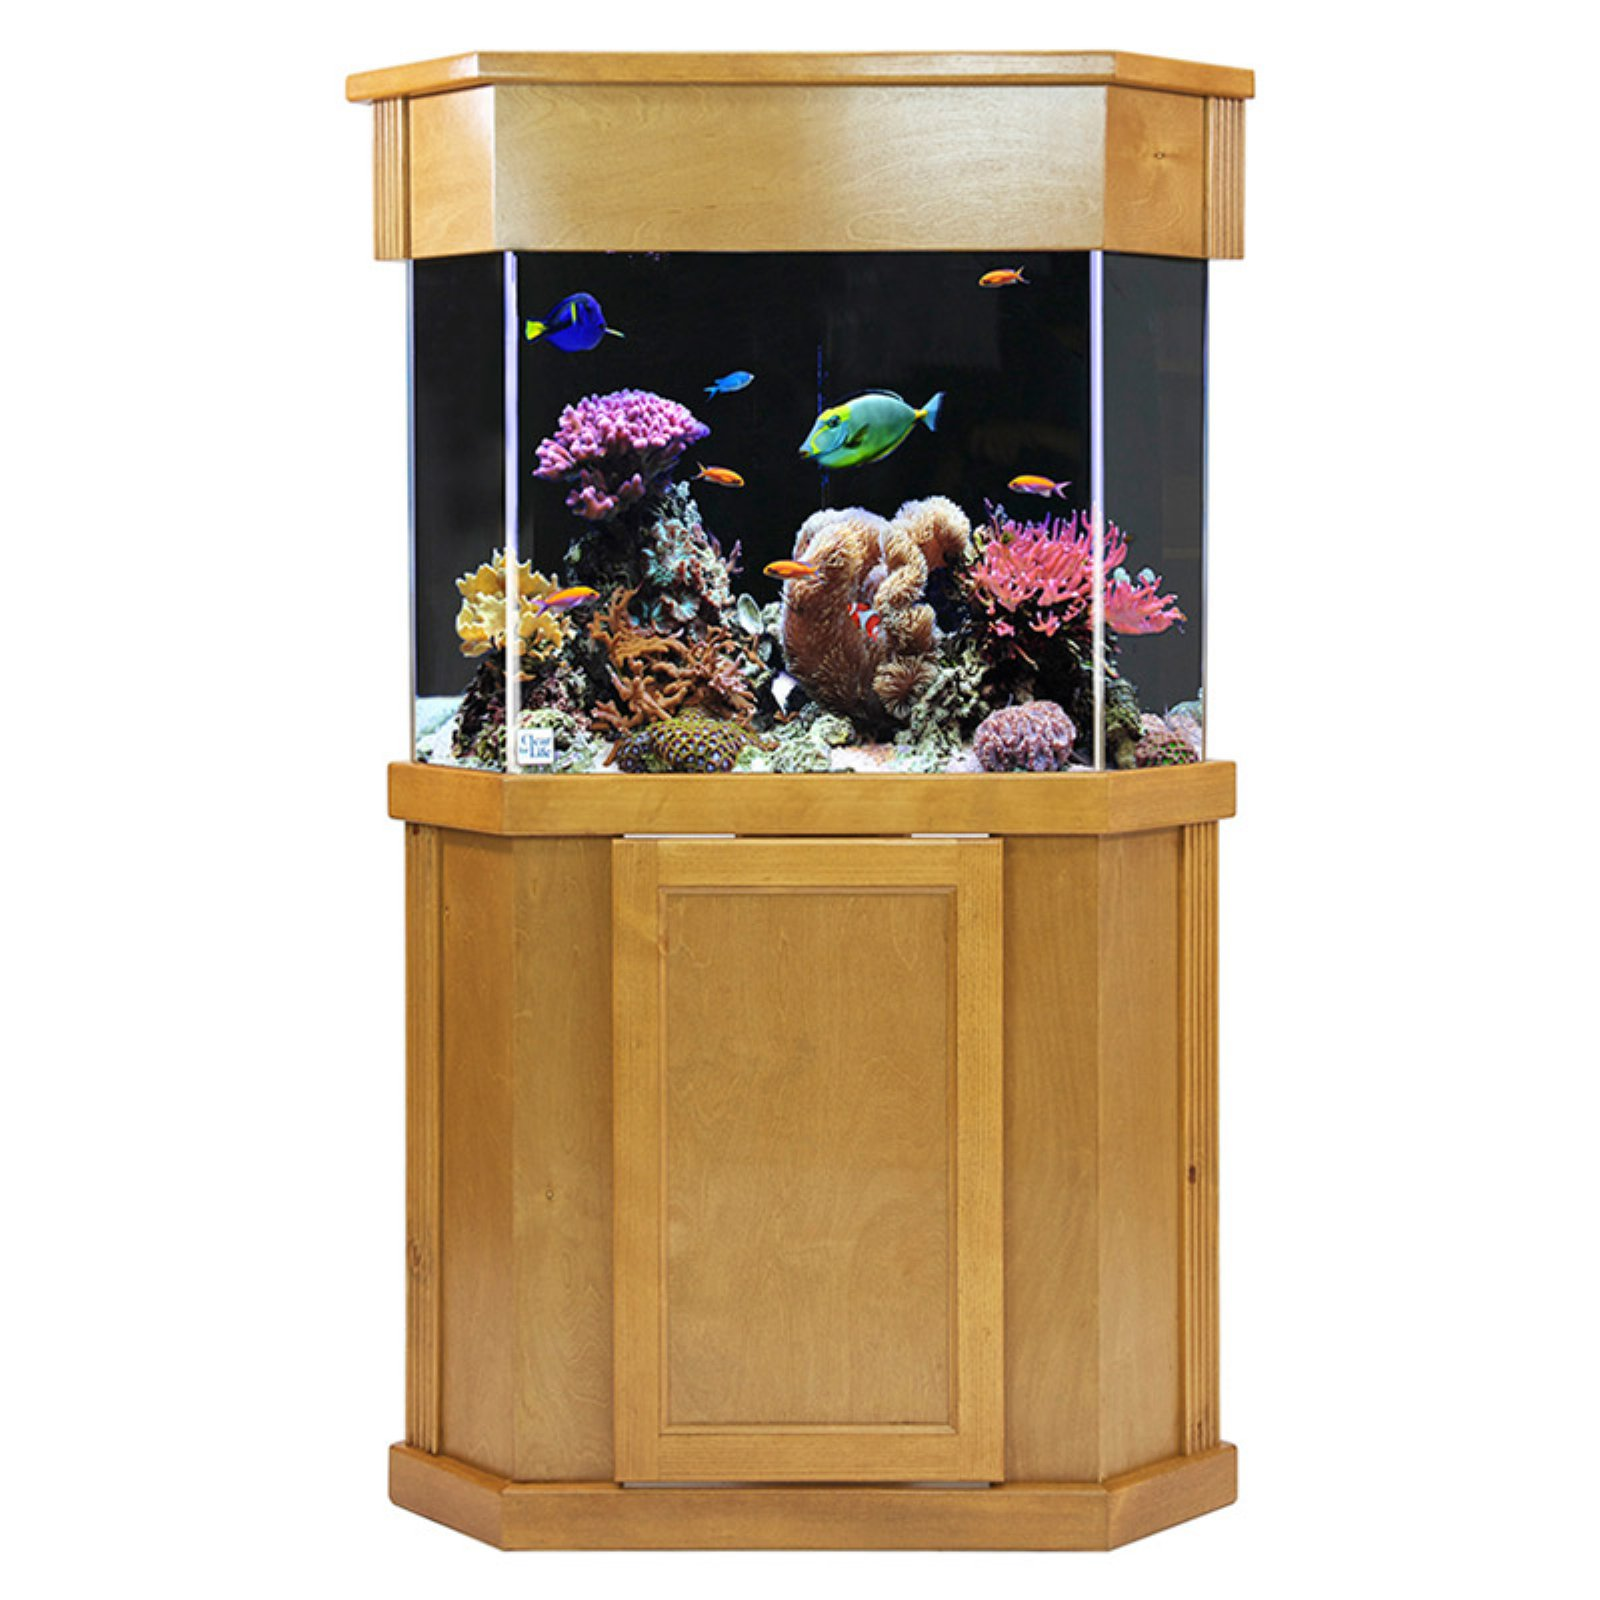 Laguna Series Pentagon Light Pine Wood Aquarium Stand